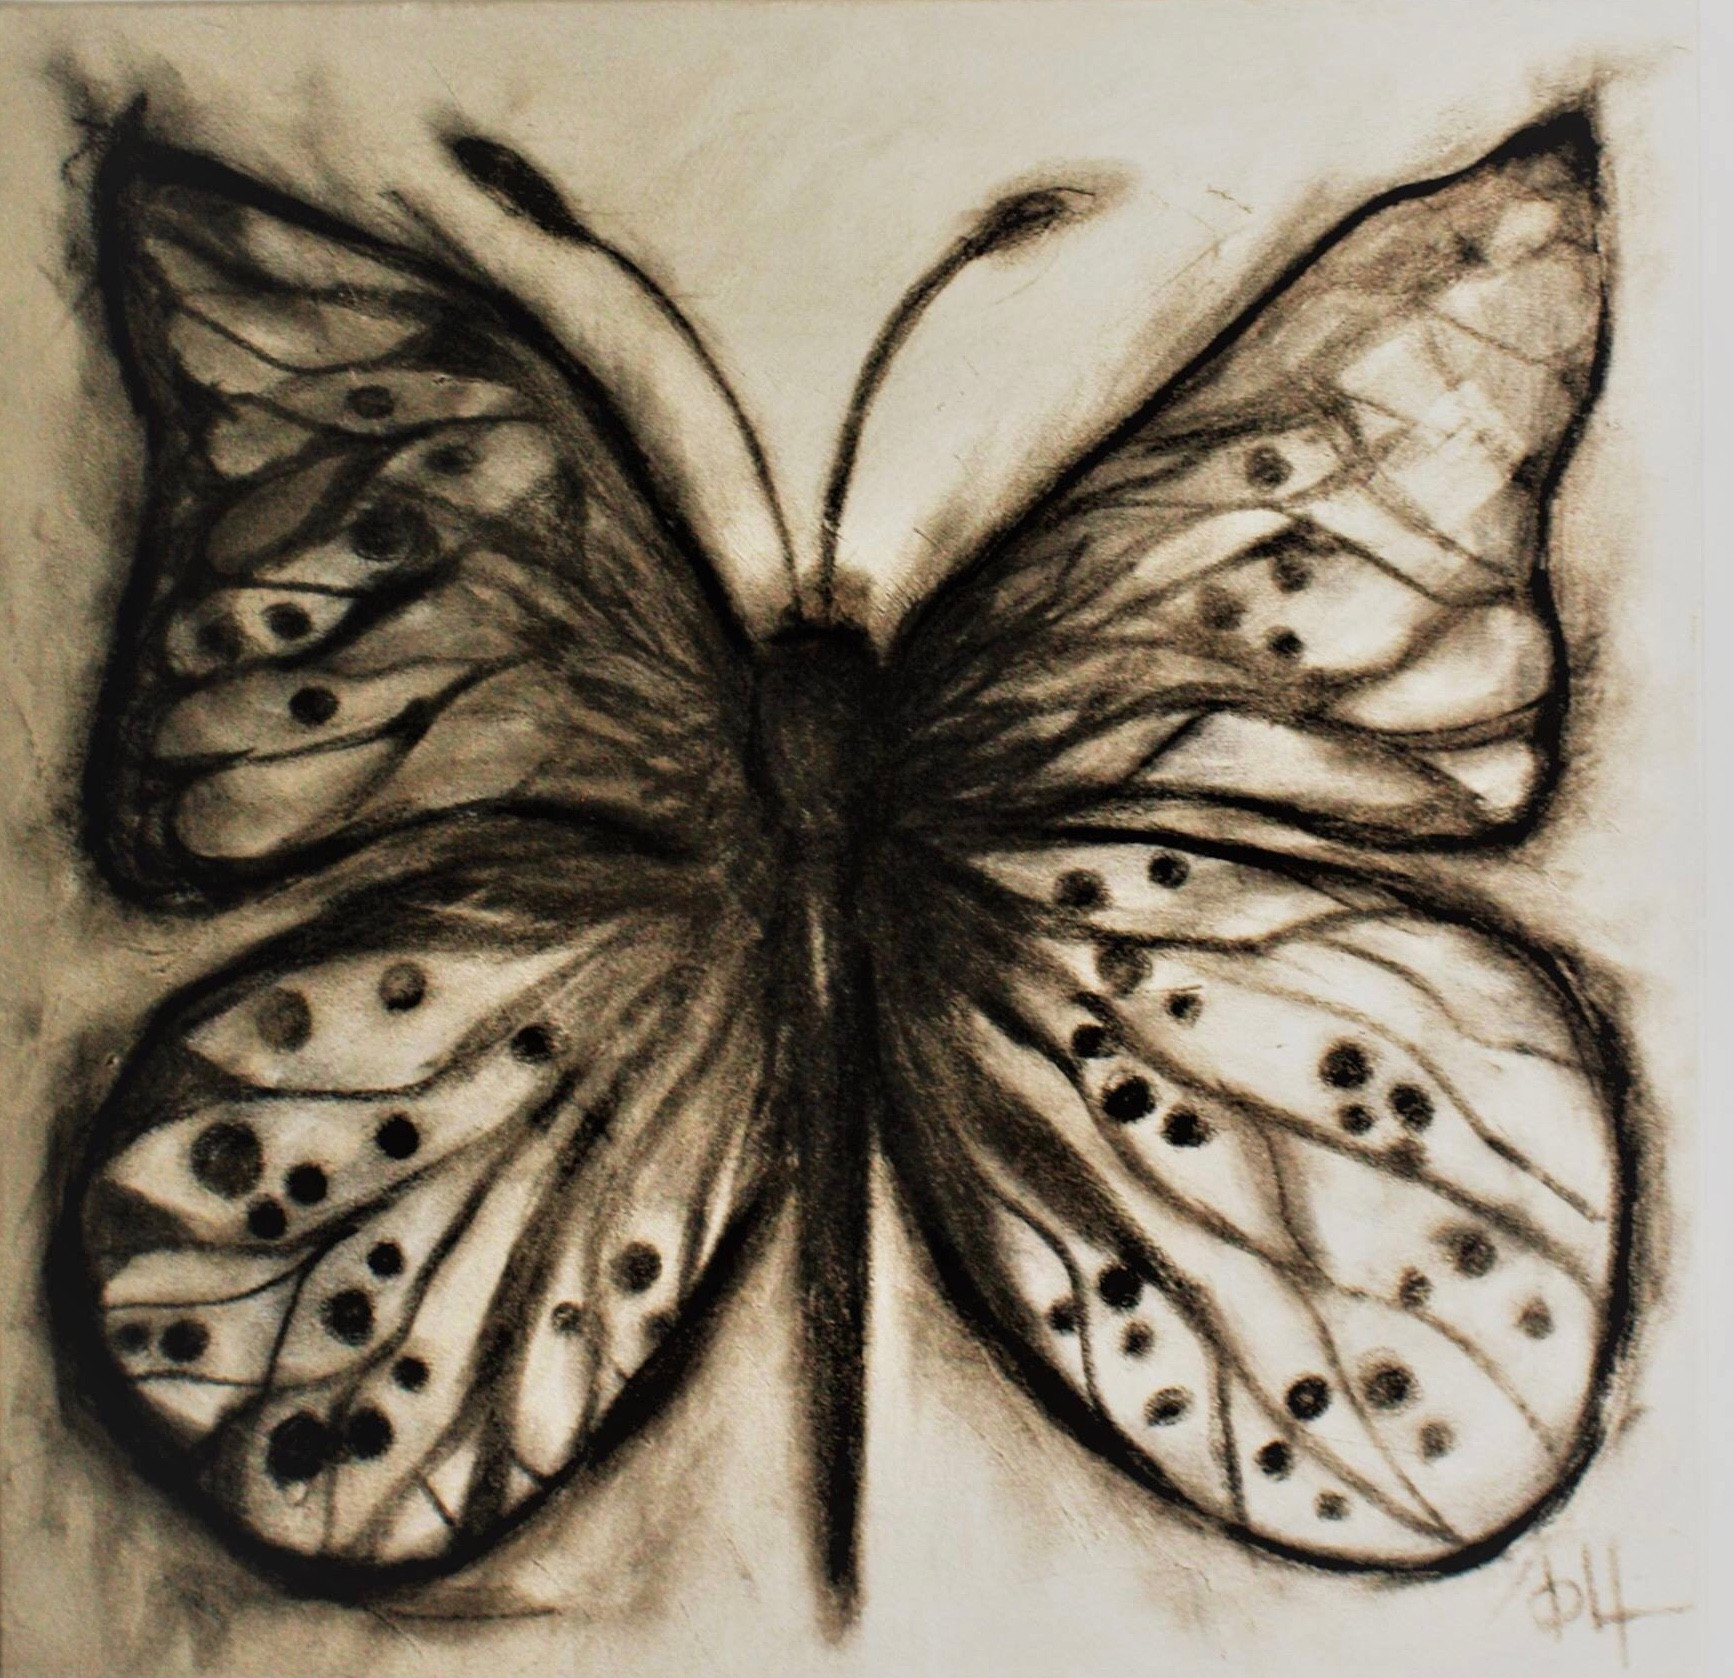 Farfalla mia